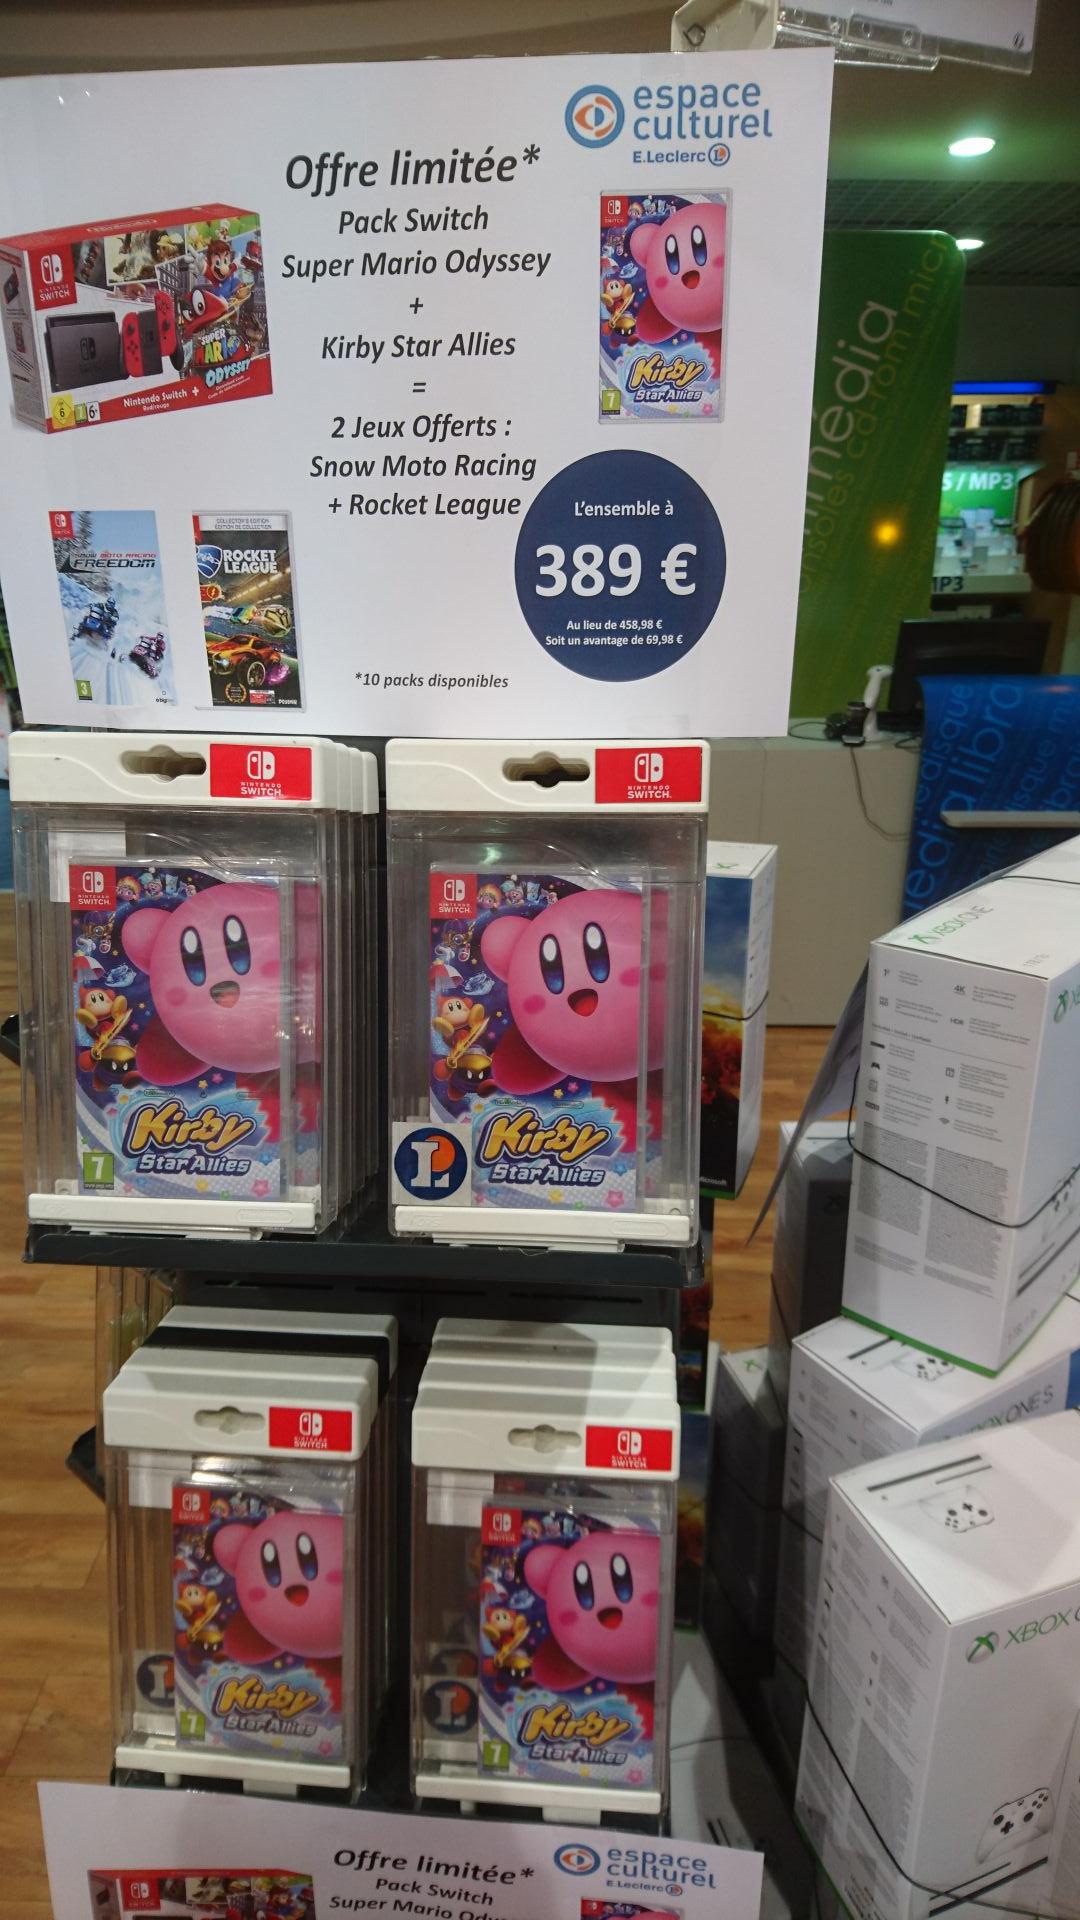 Pack Nintendo Switch Super Mario + Kirby Star Allies + 2 Jeux offerts (Snow Moto Racing + Rocket League) (Centre-Val de Loire 45)